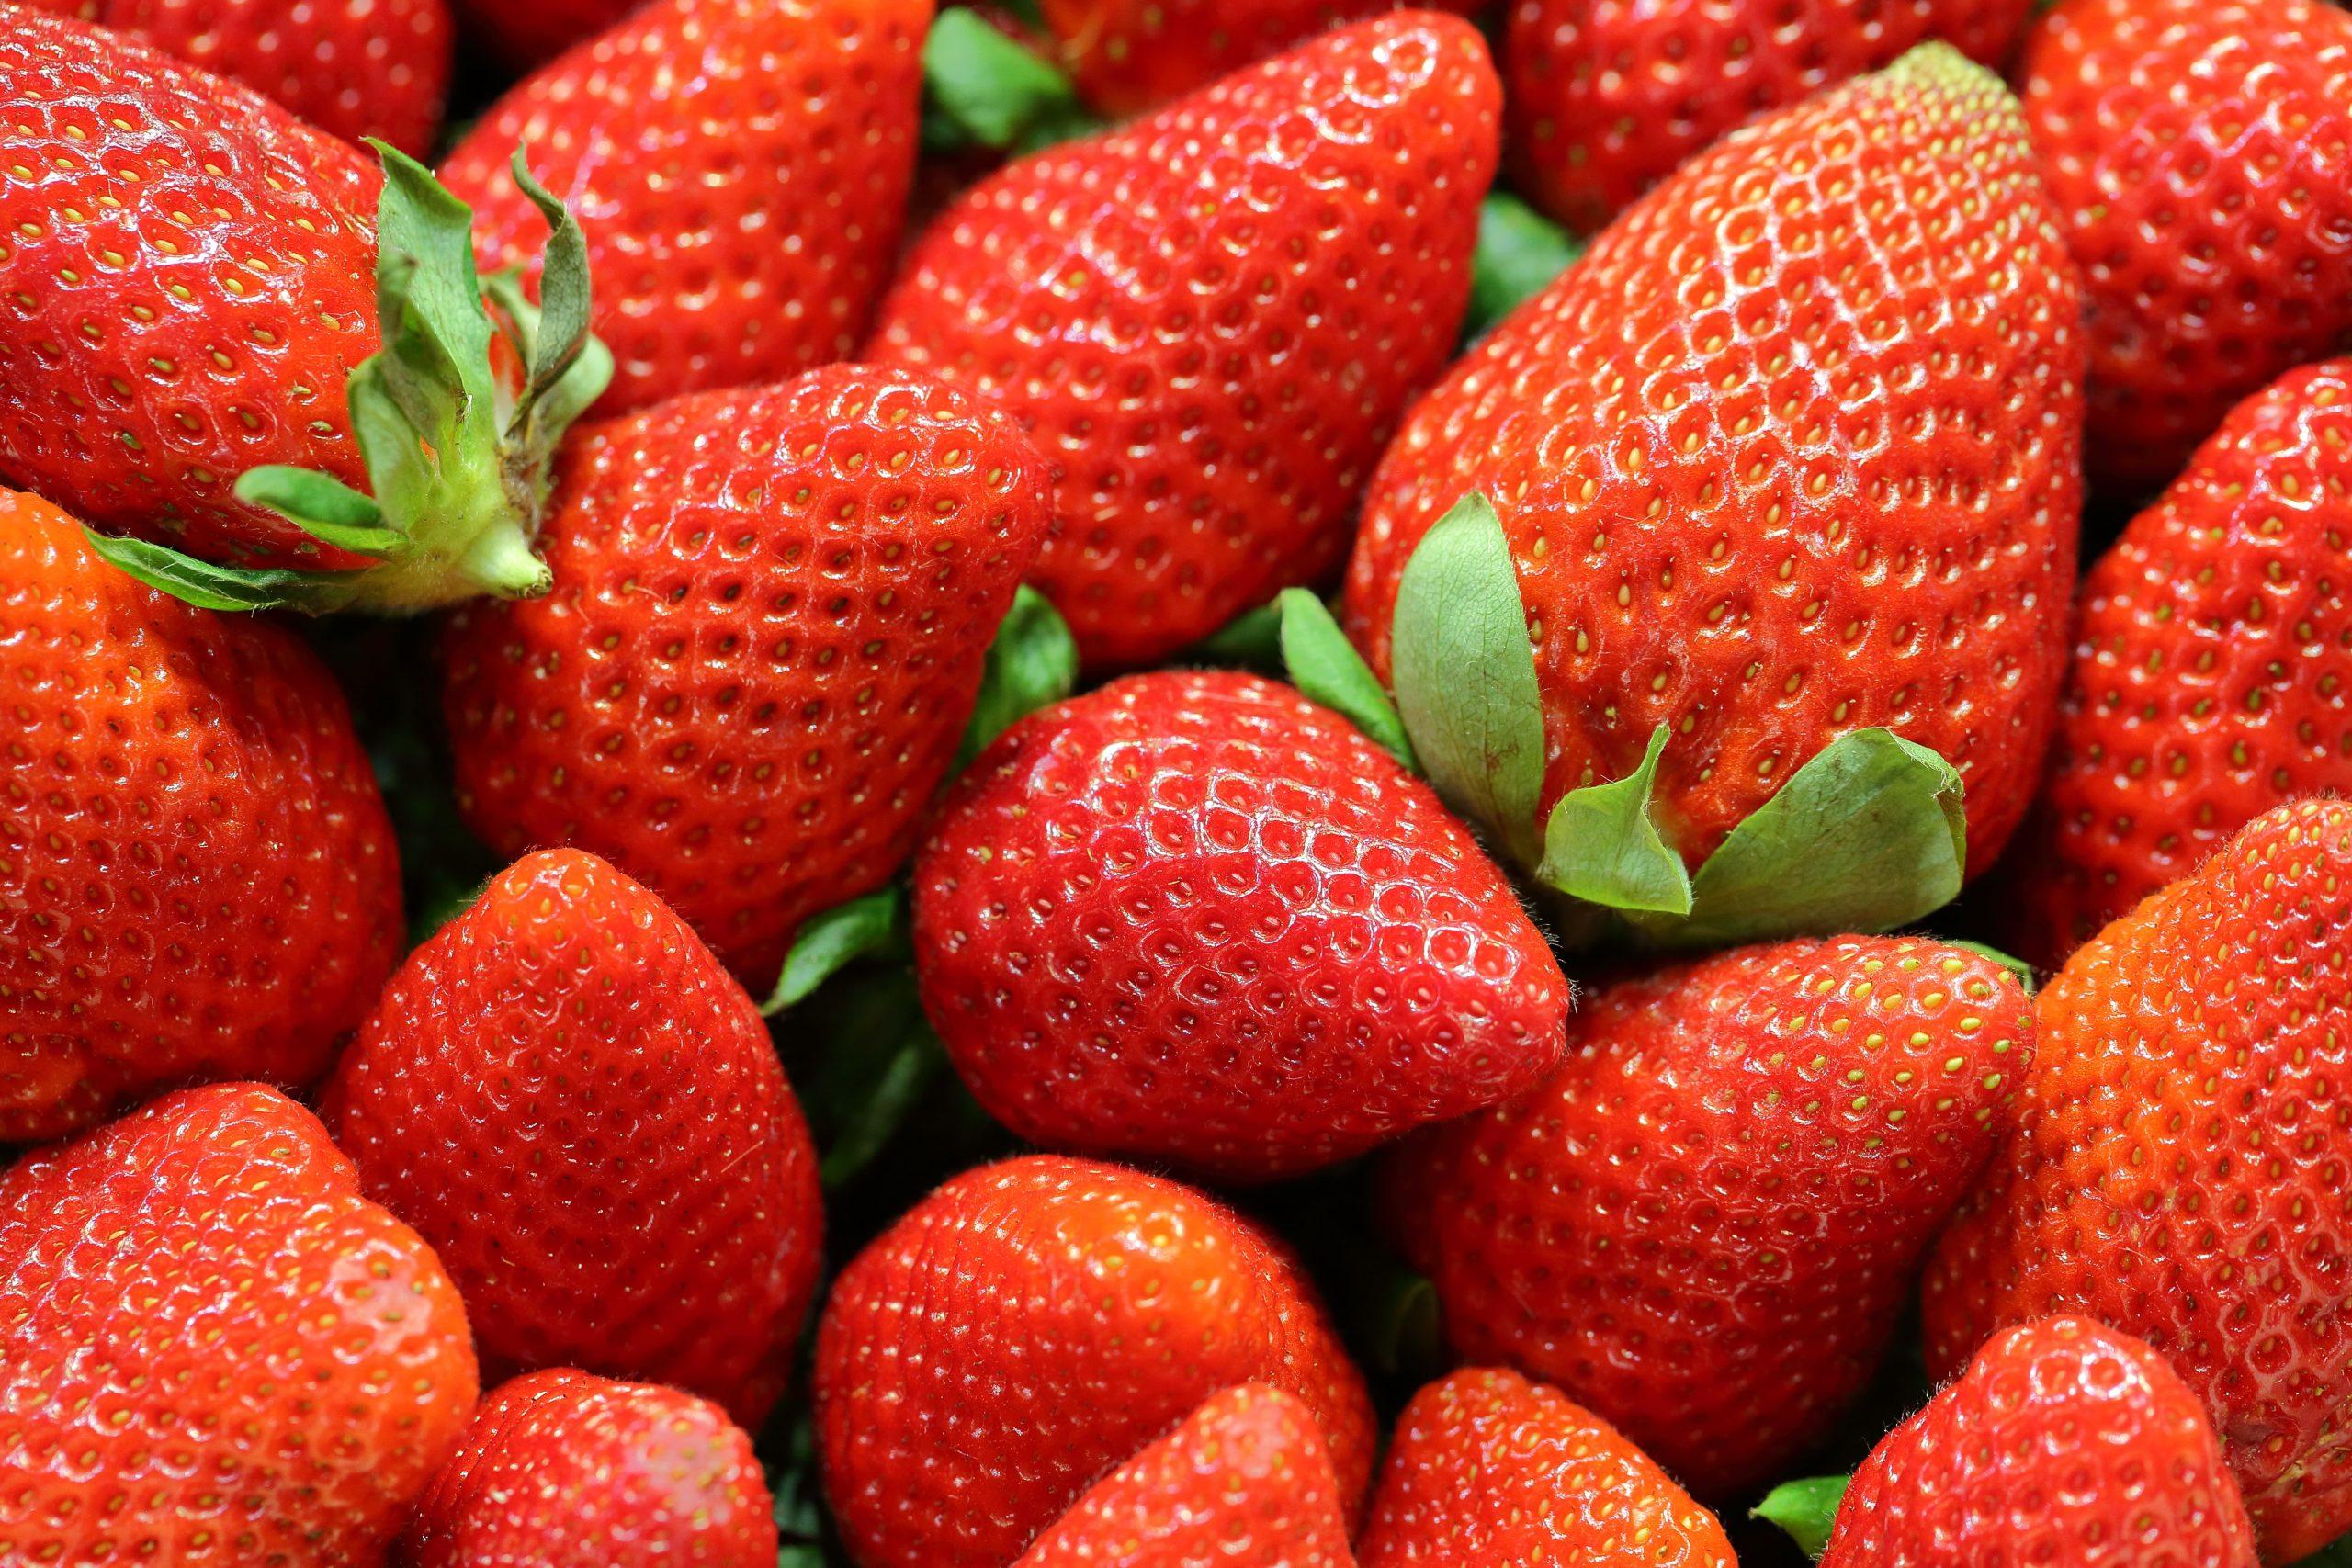 loads of strawberries